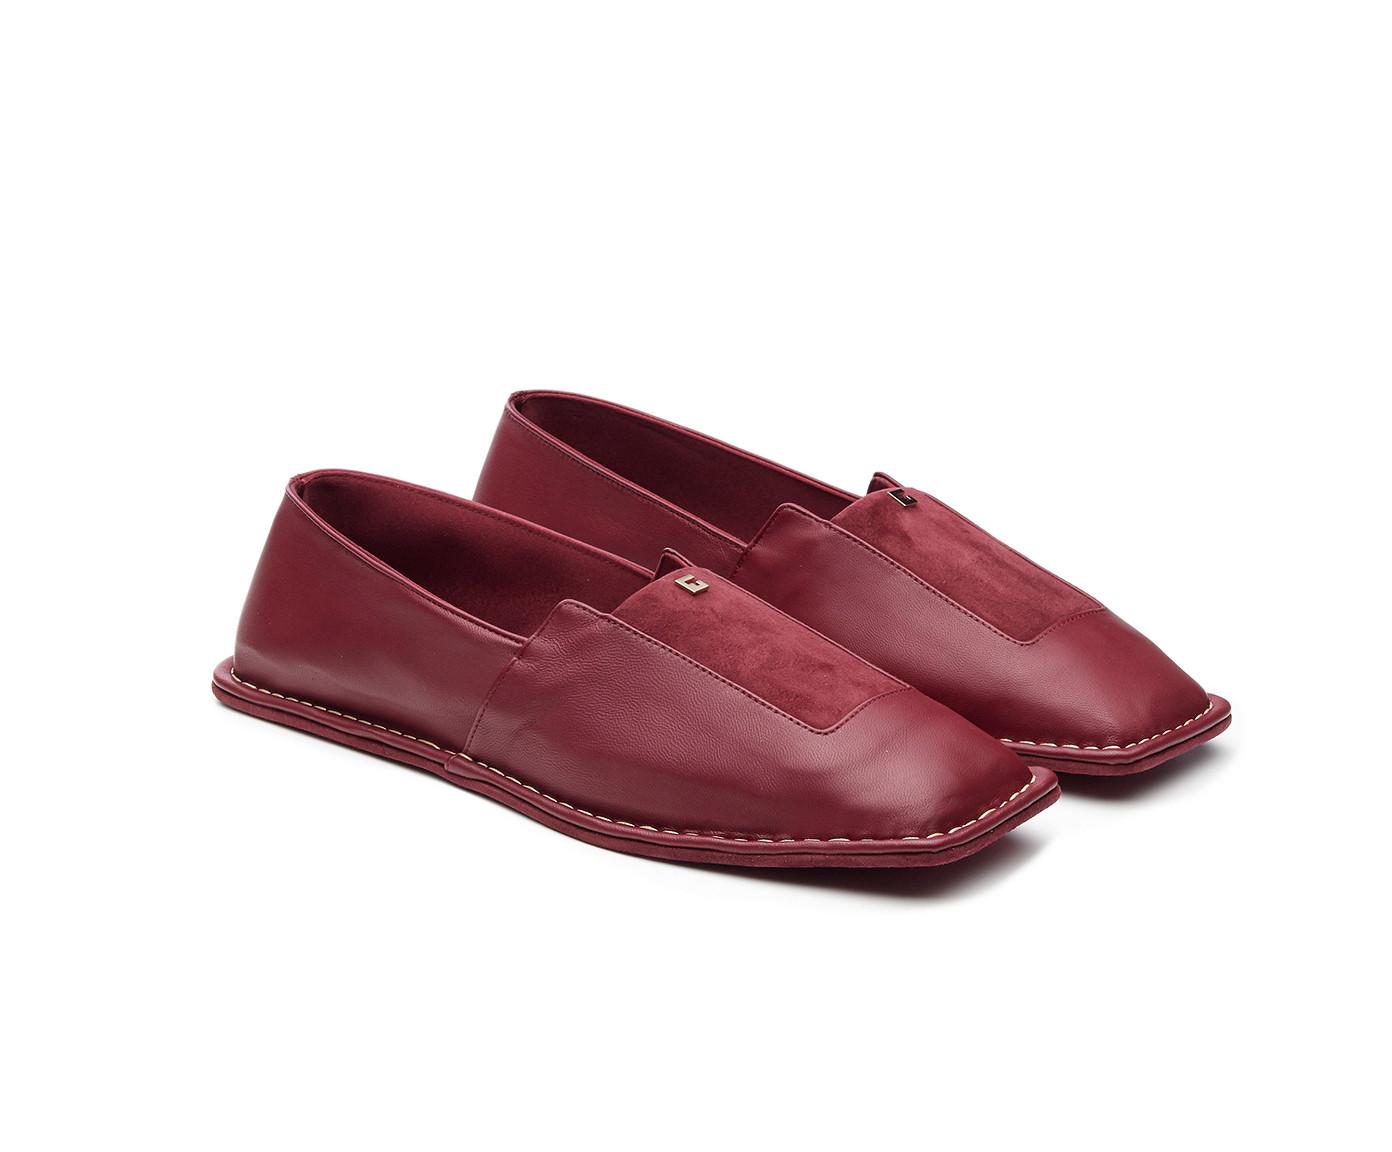 Giordano Torresi scarpe | IANUS